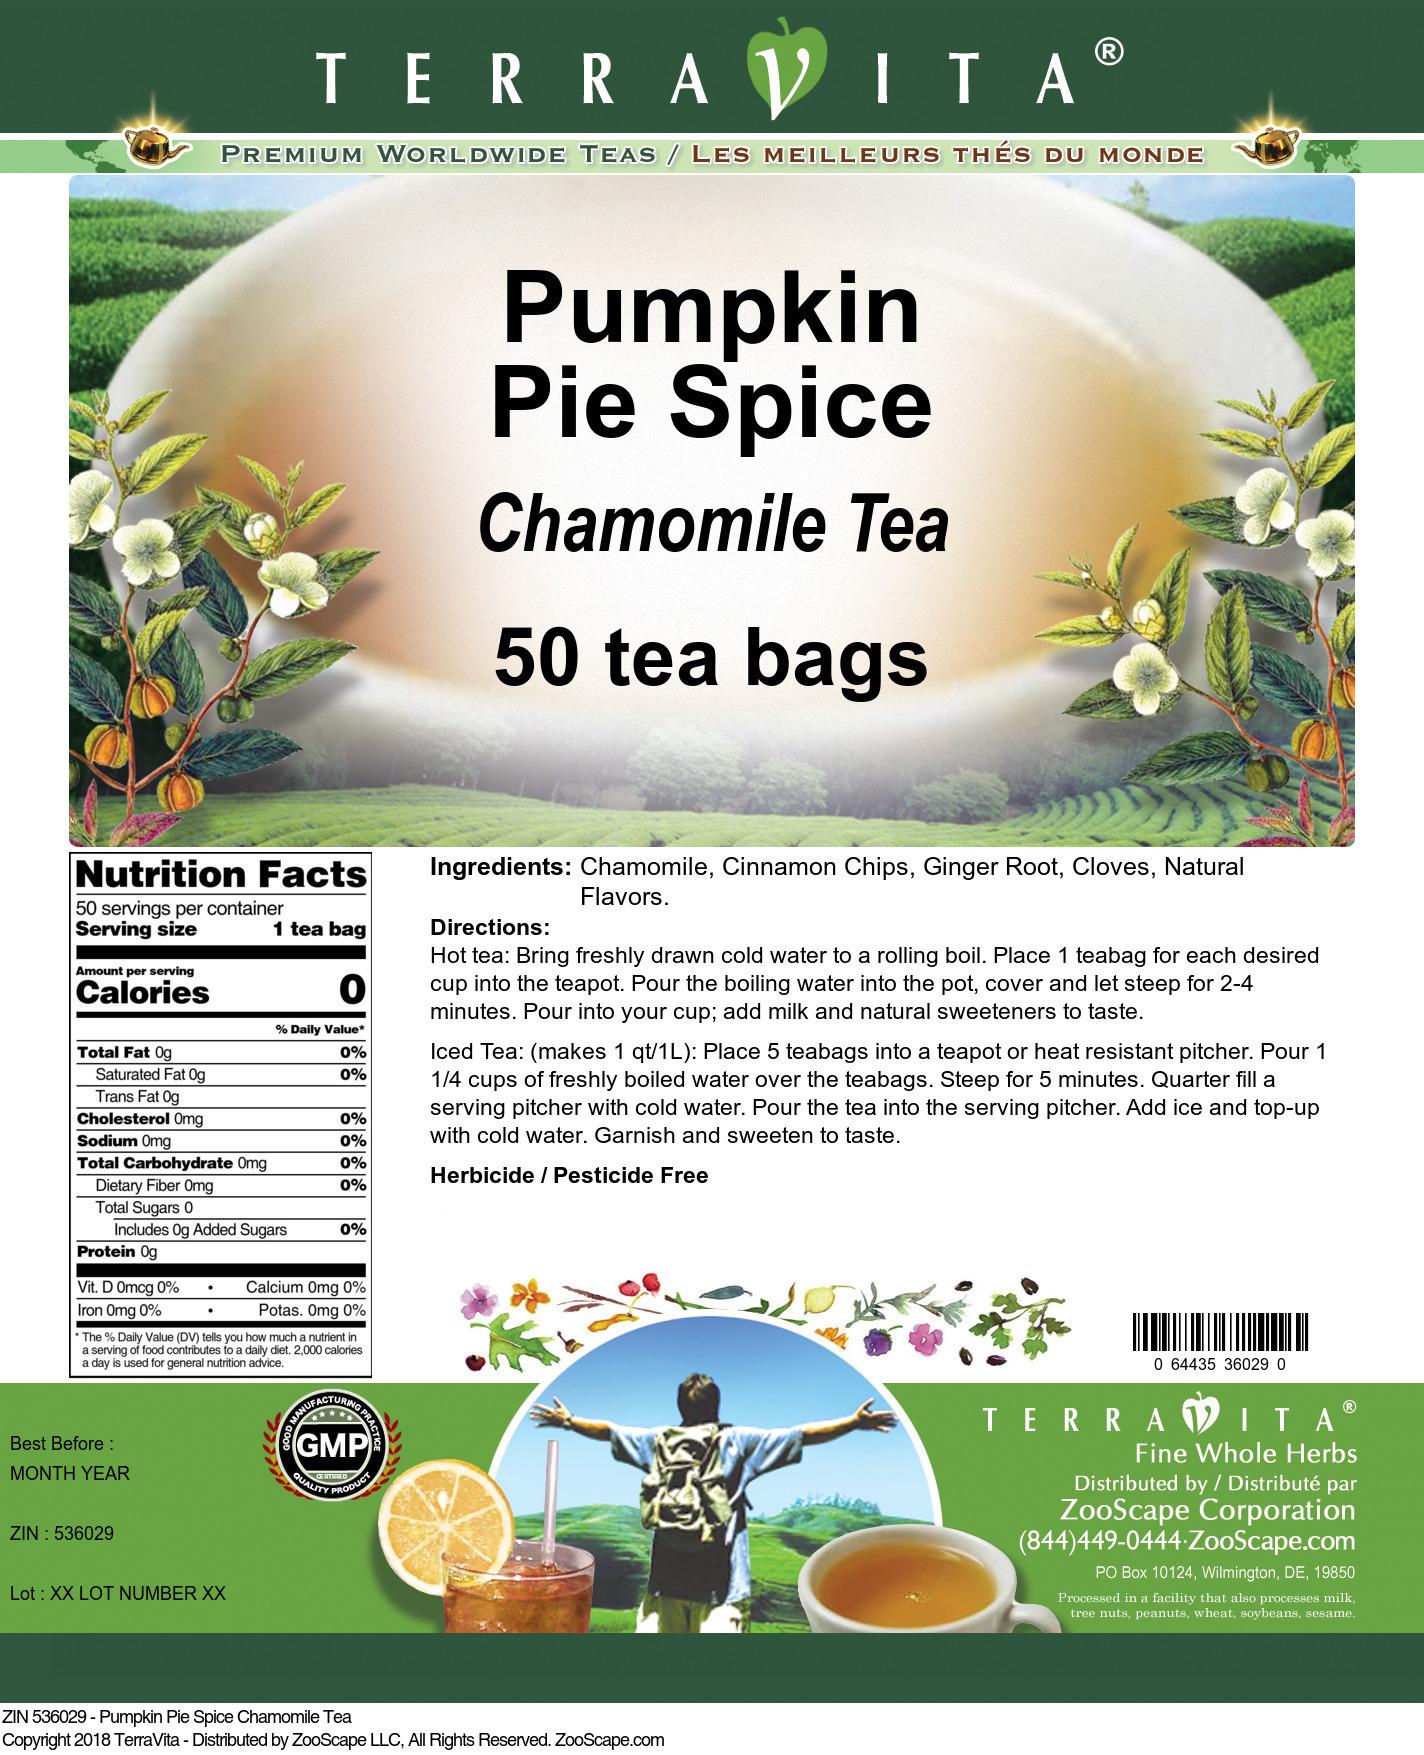 Pumpkin Pie Spice Chamomile Tea